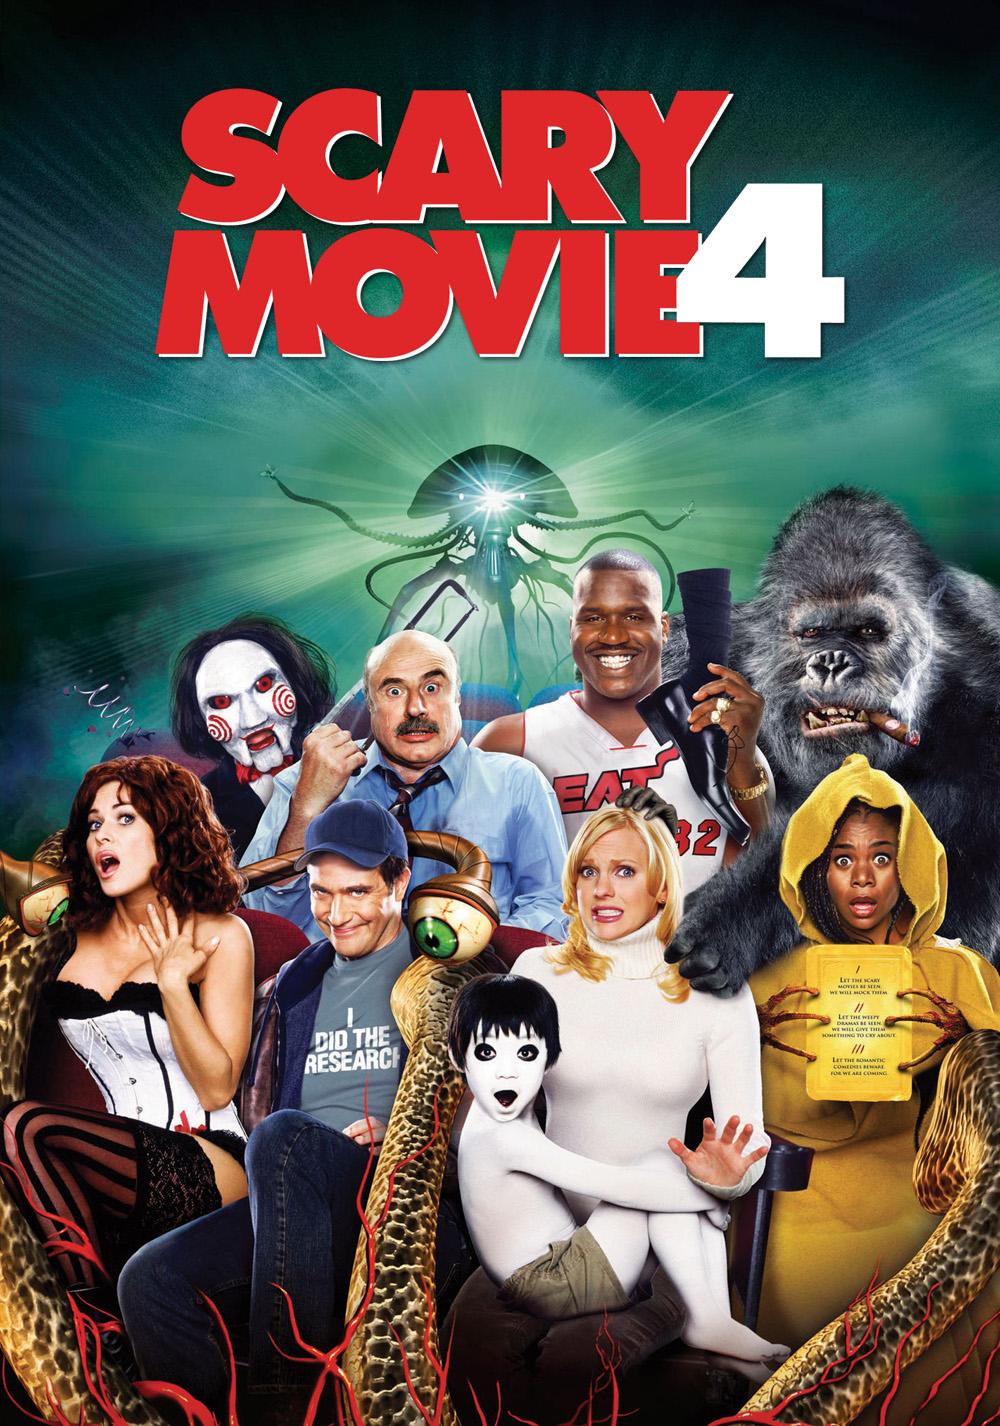 Sxay movies